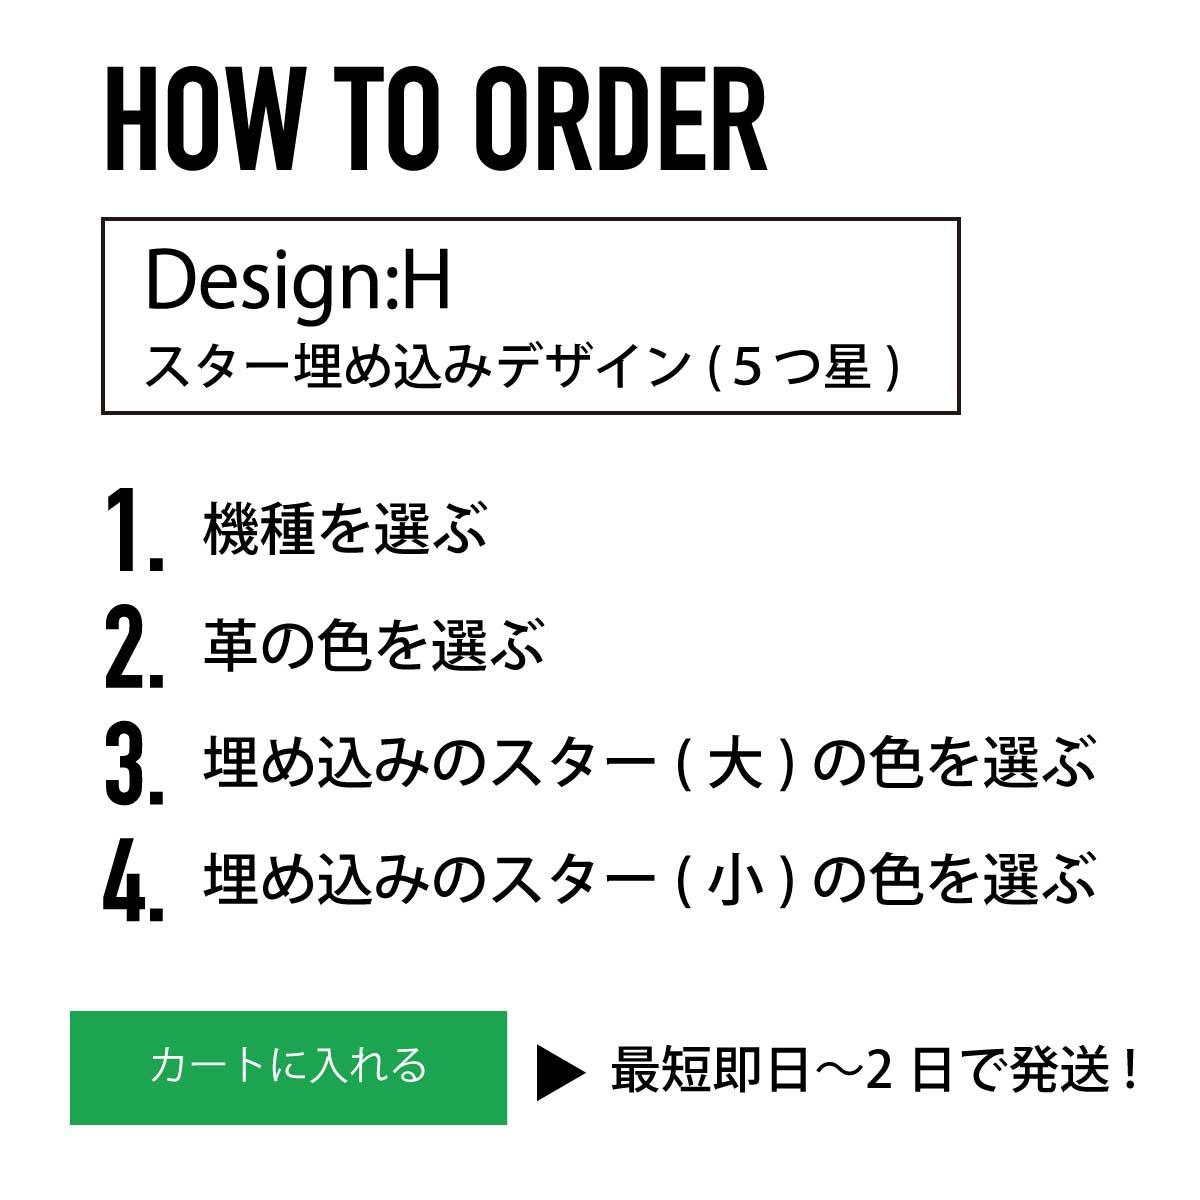 iPhoneOpenCase:   DesignH:マーク埋込み/スターズ